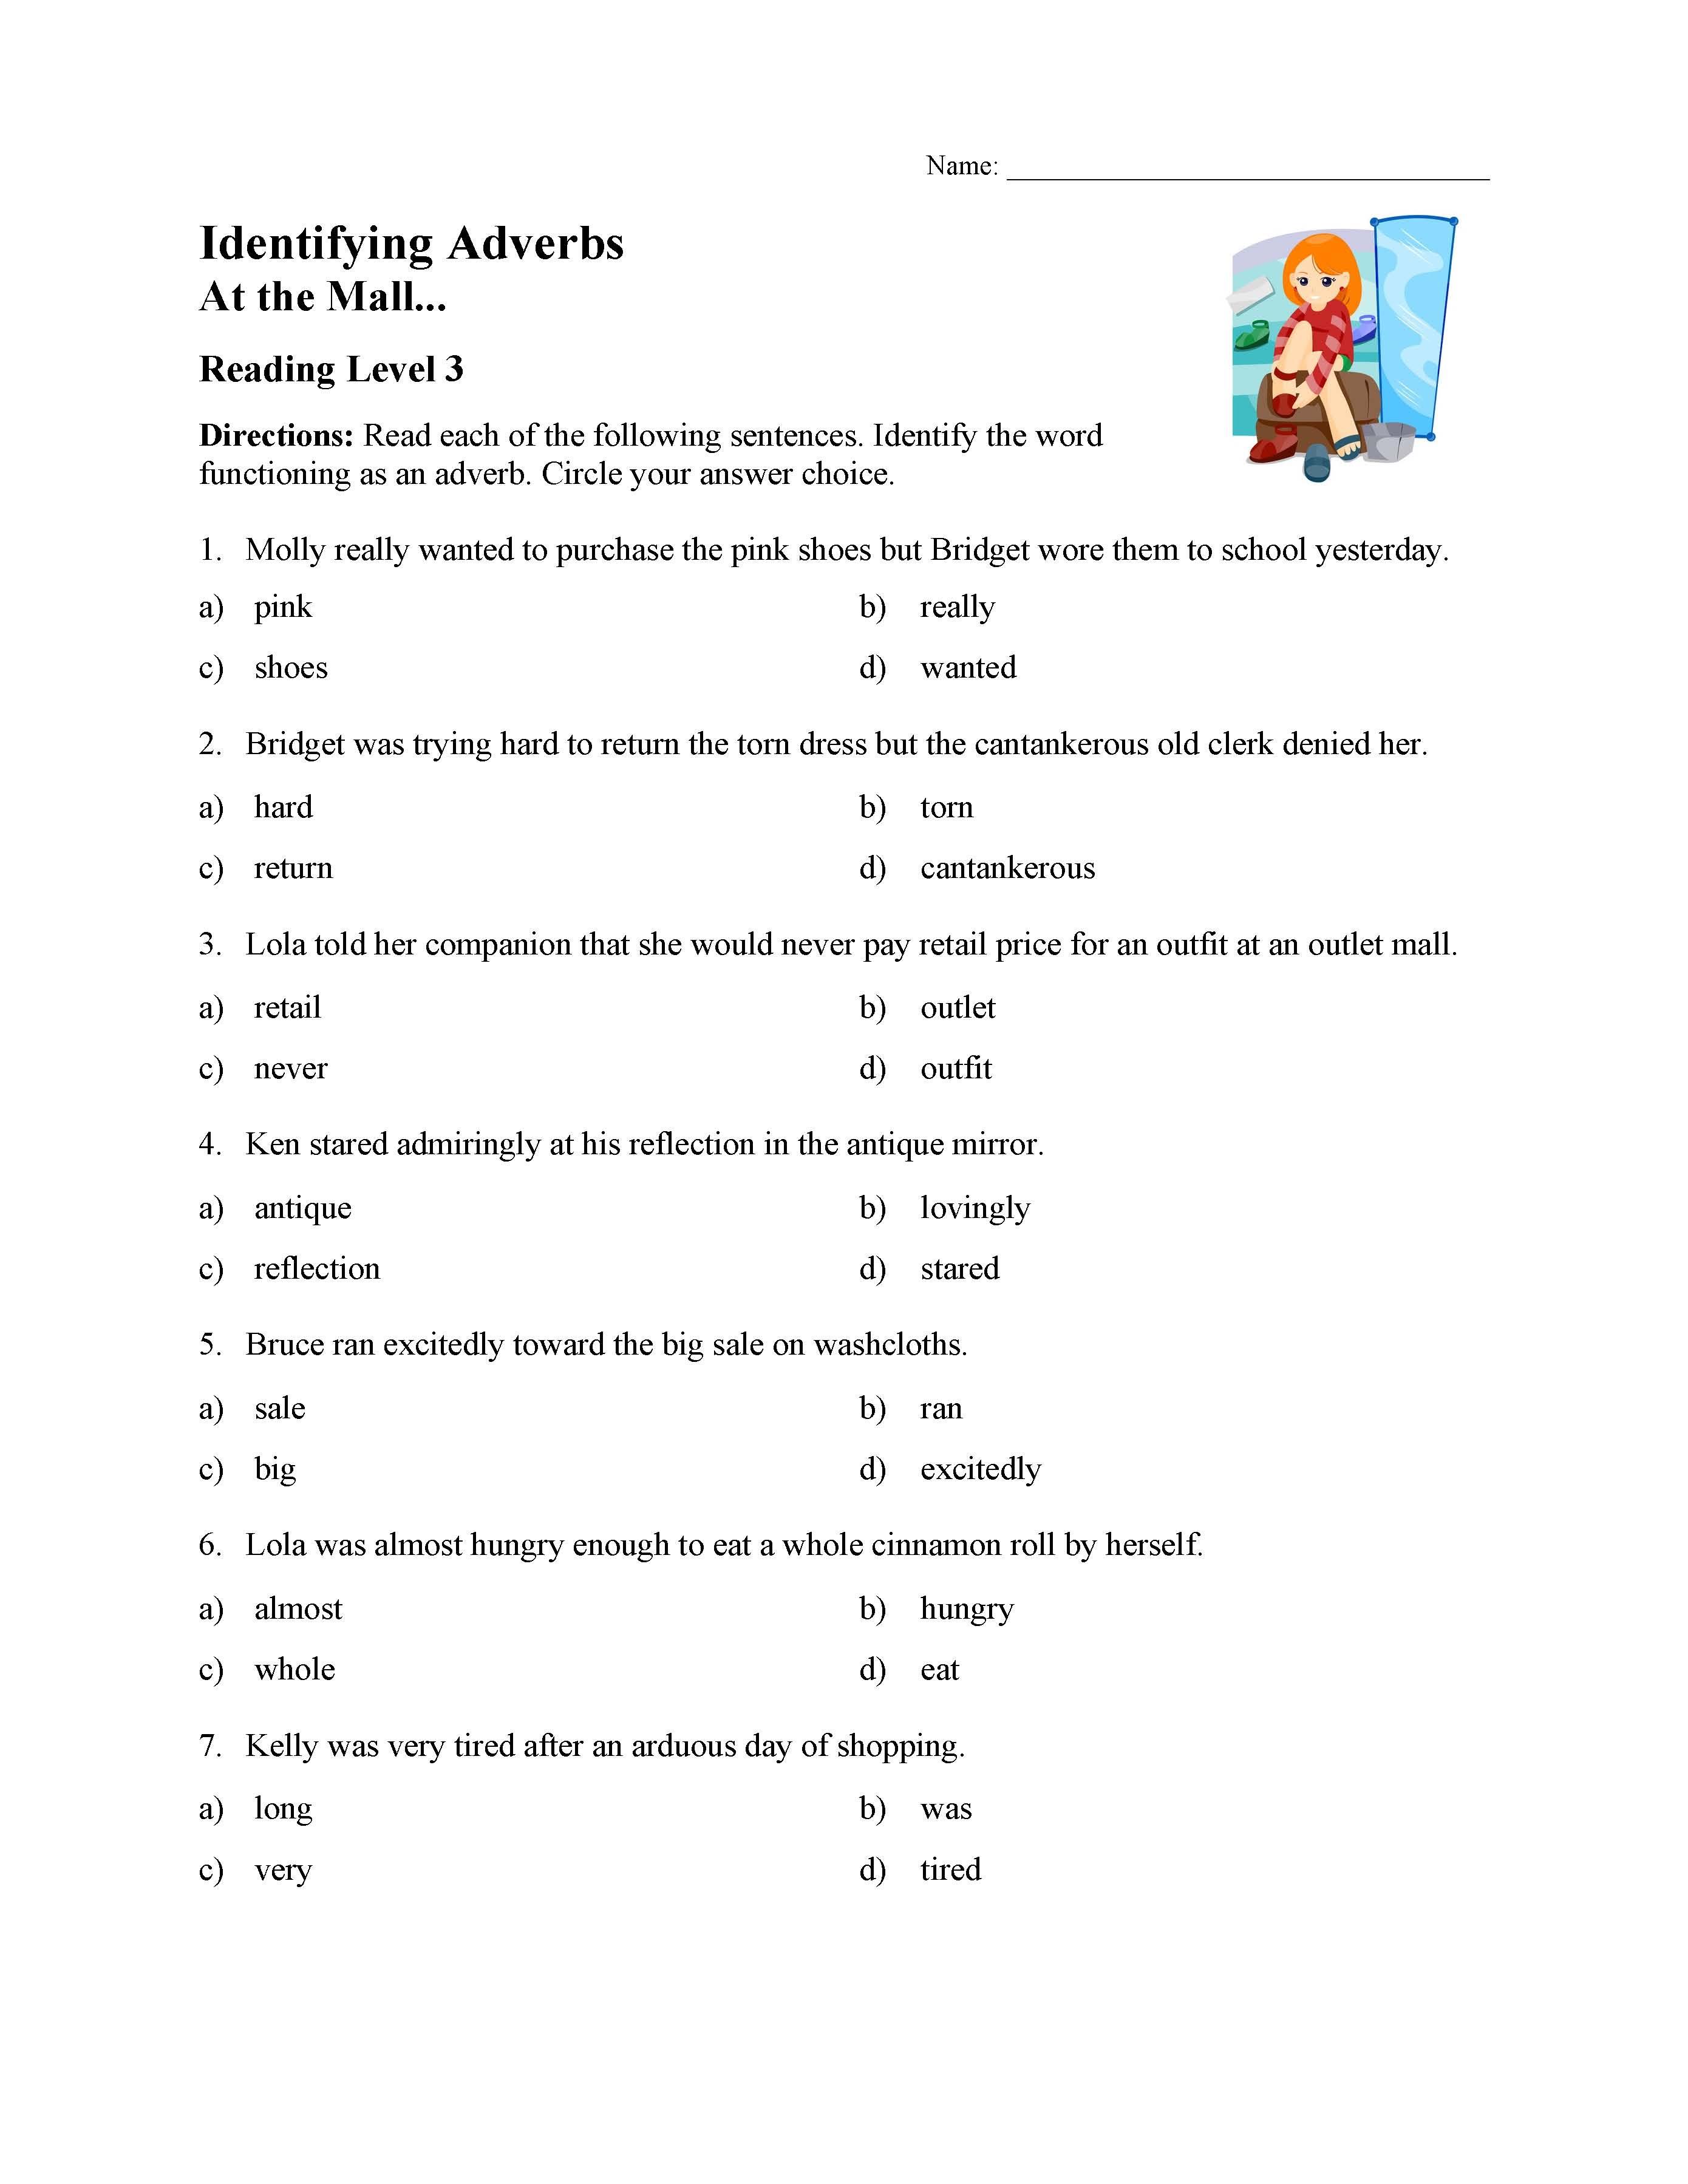 Identifying Adverbs Test